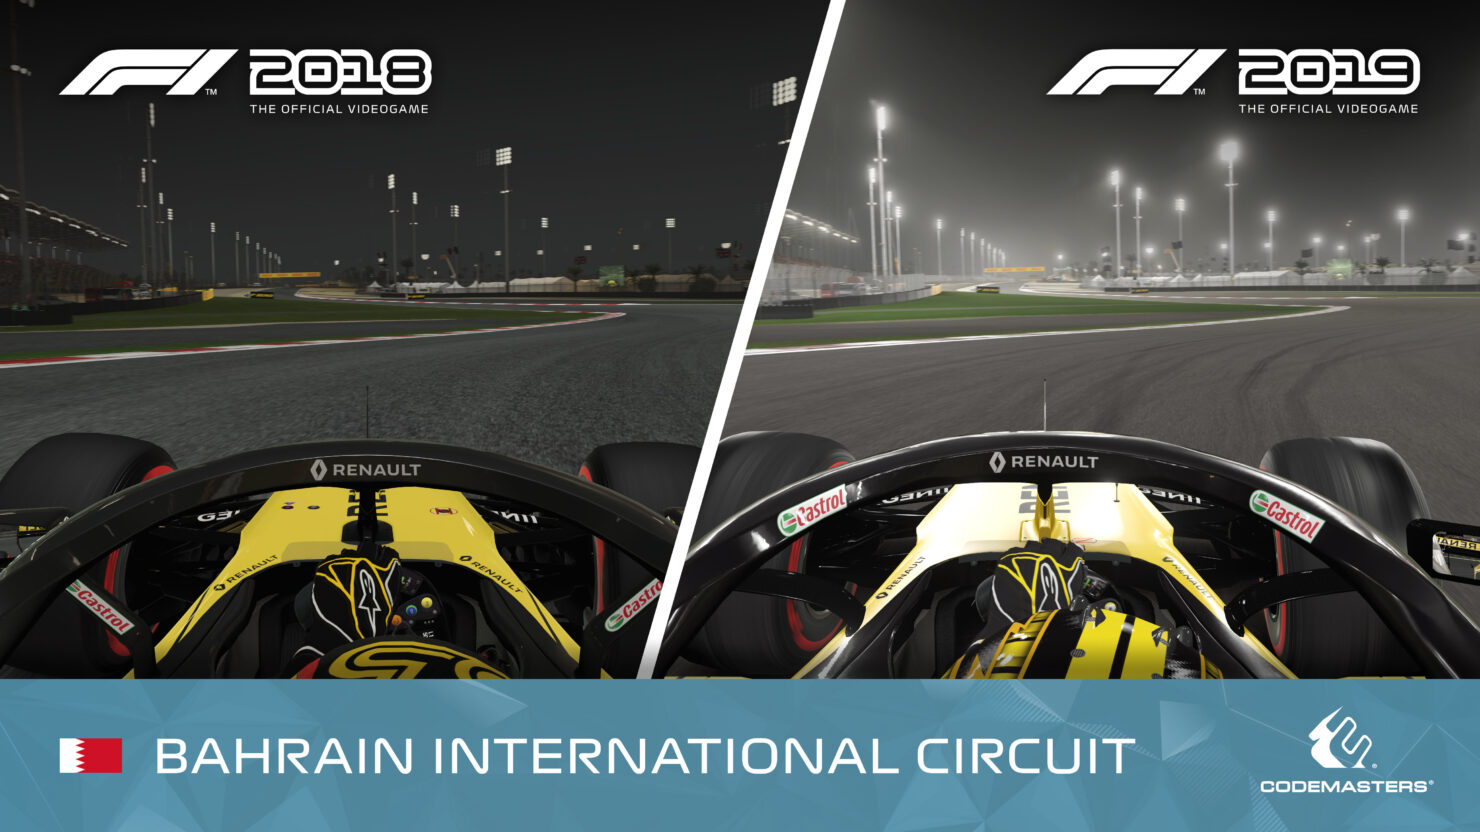 f1-2019-night-lighting-comparison-04-comparison-part-2